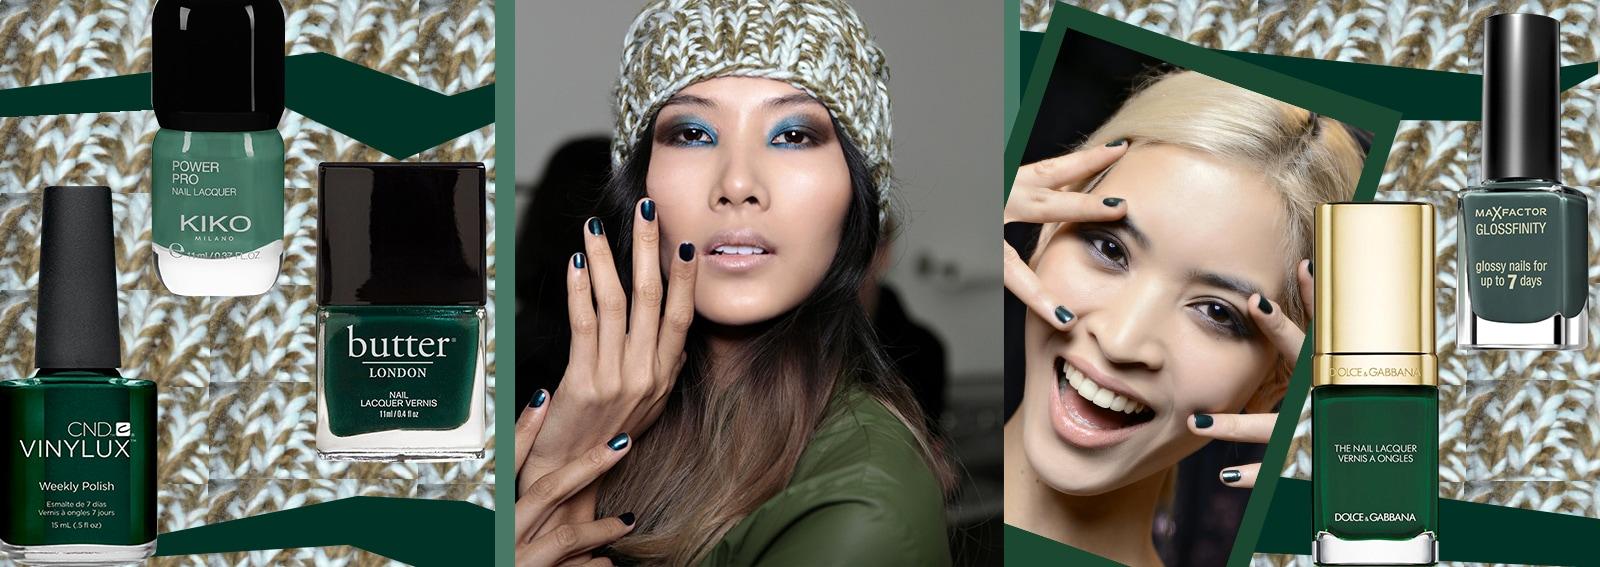 smalti-verde-bosco-la-manicure-desktop